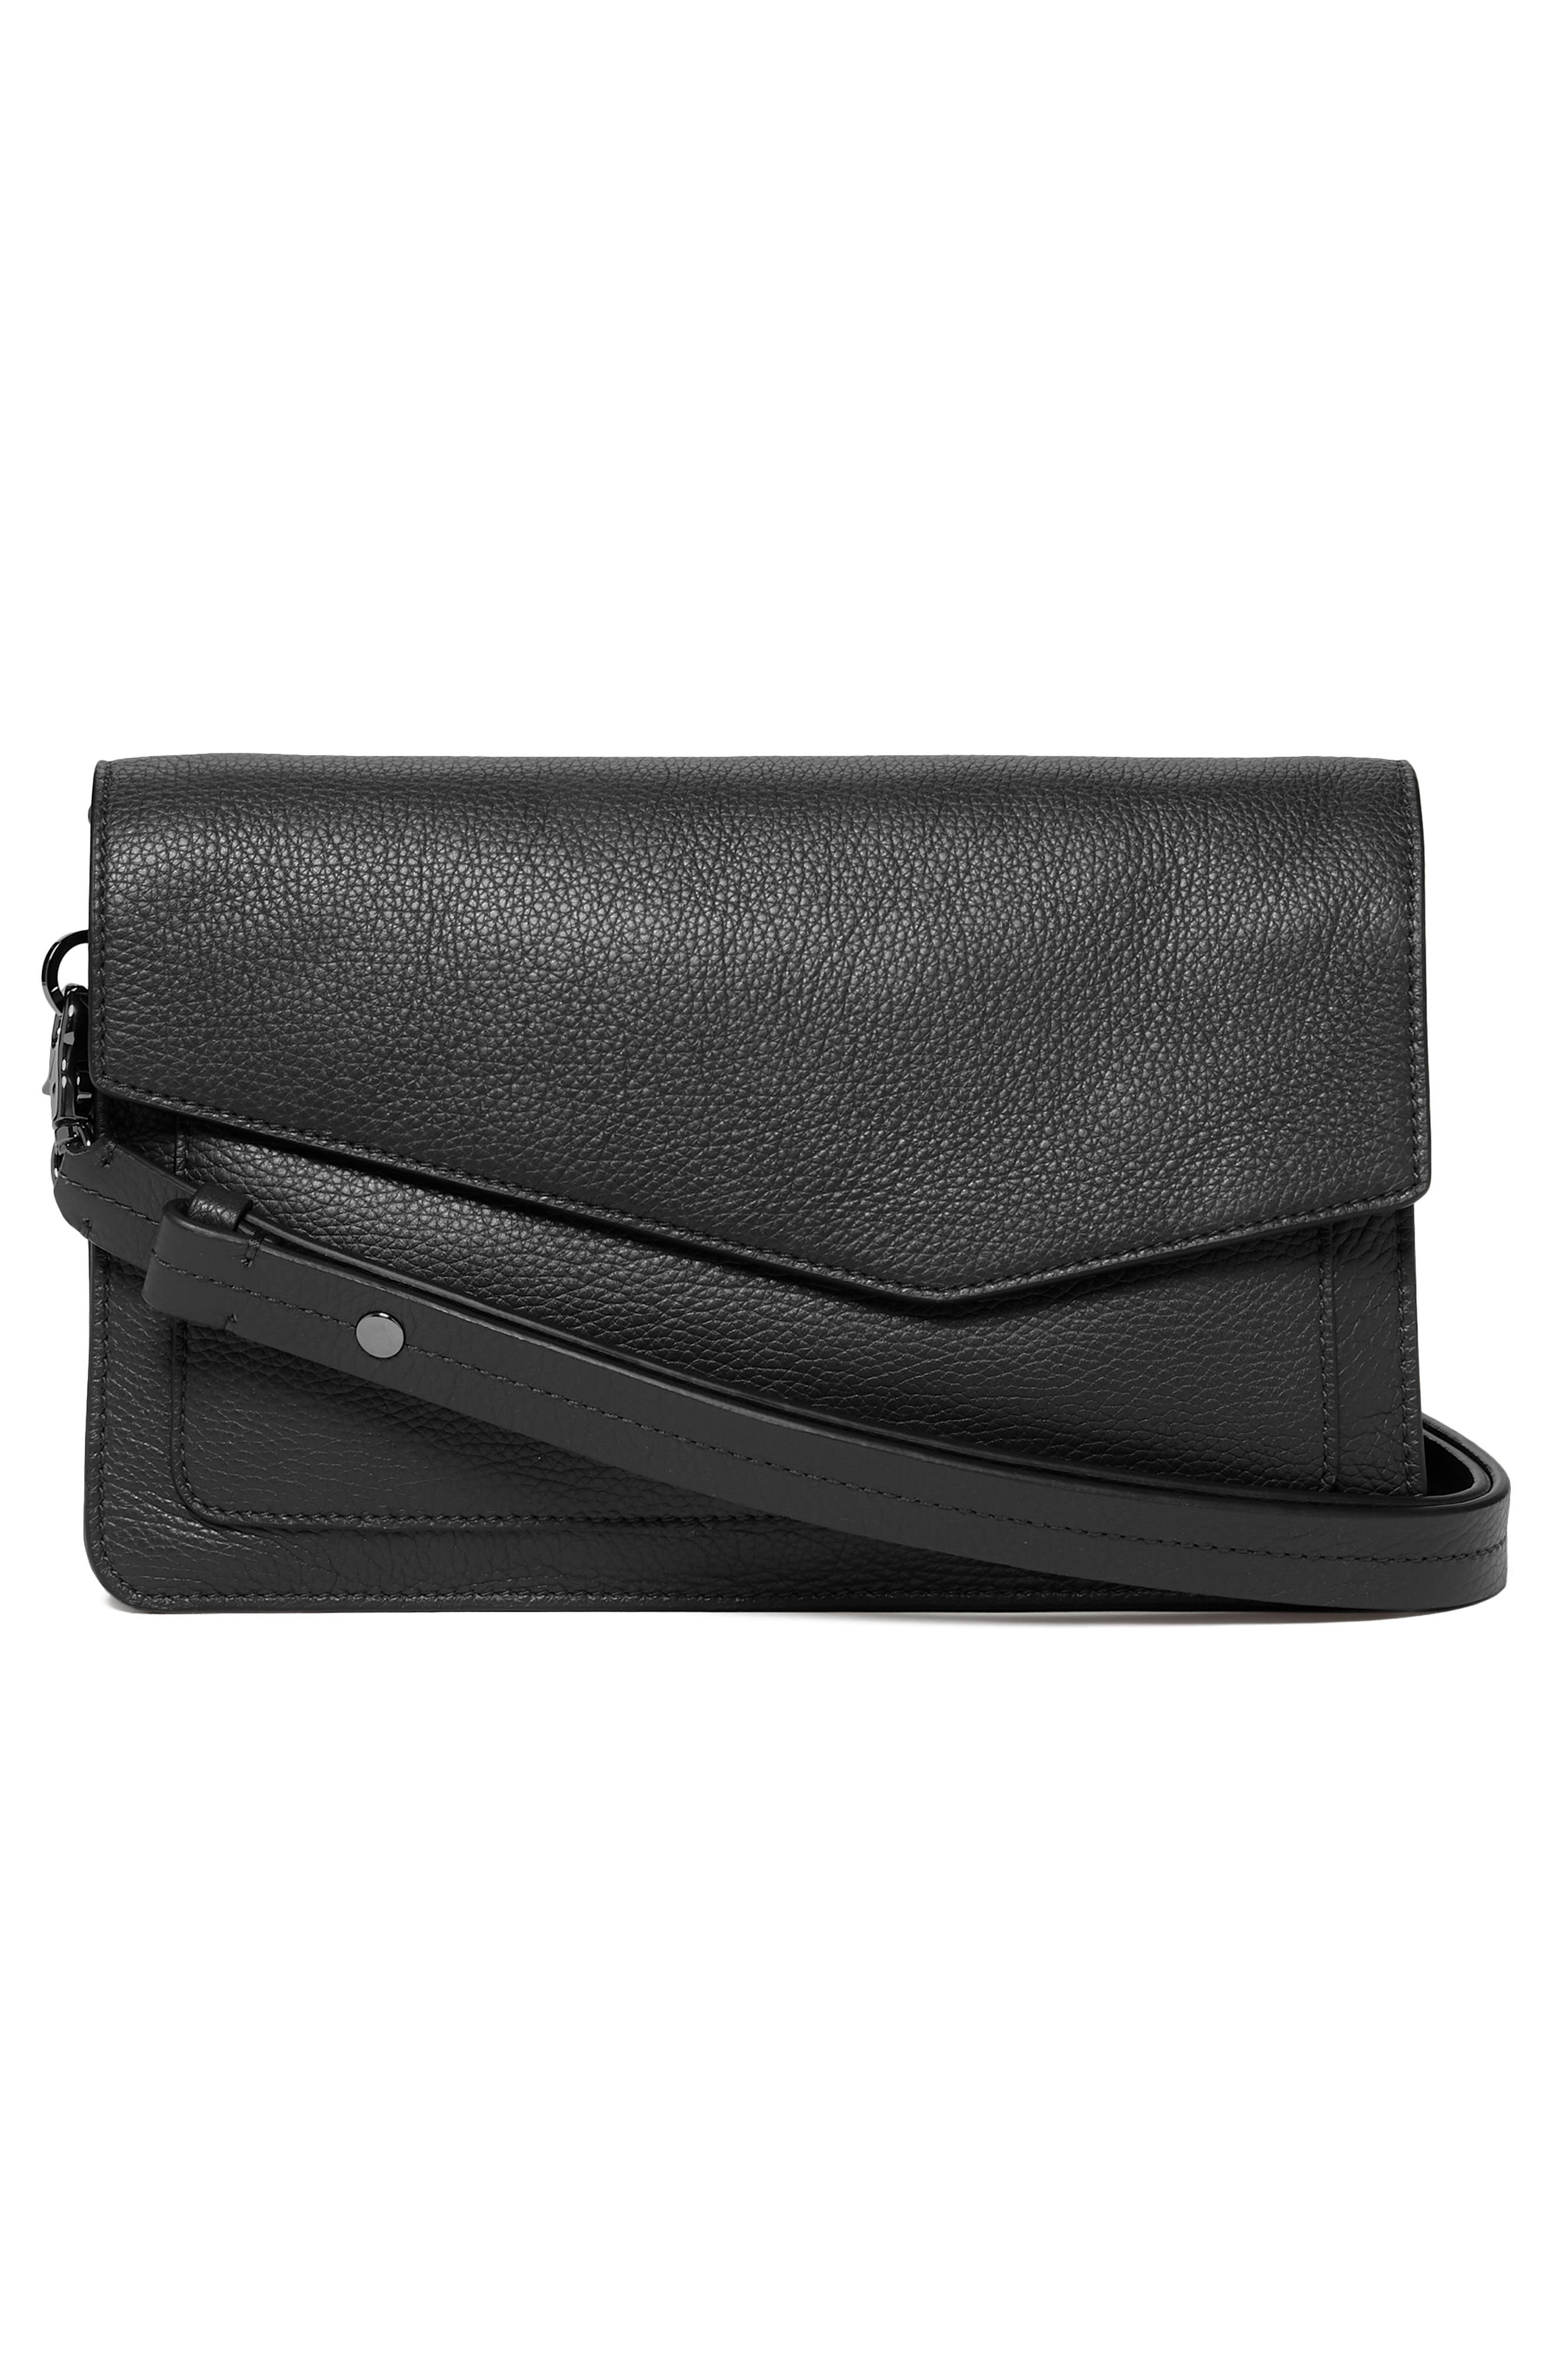 Cobble Hill Leather Shoulder Bag,                             Alternate thumbnail 4, color,                             BLACK